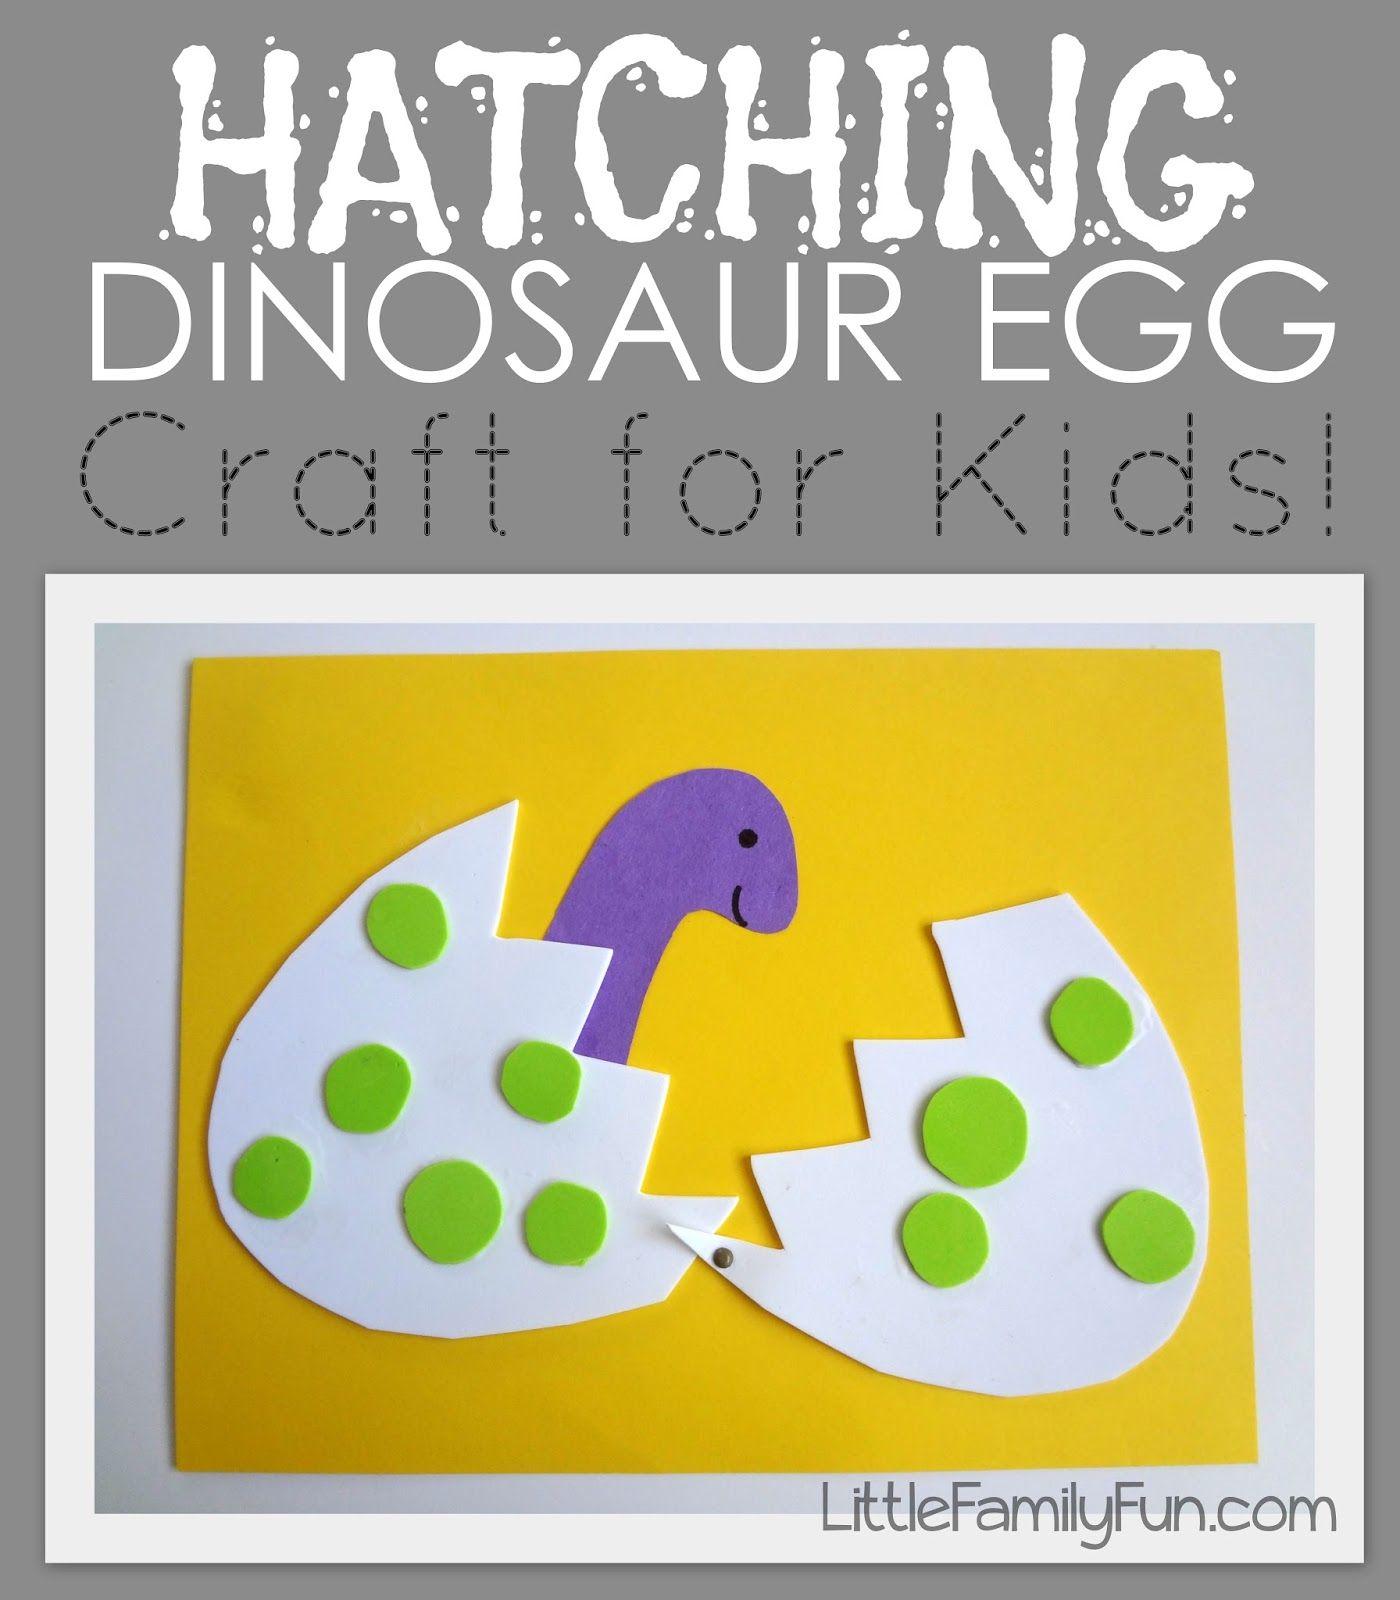 Hatching Dinosaur Egg Craft